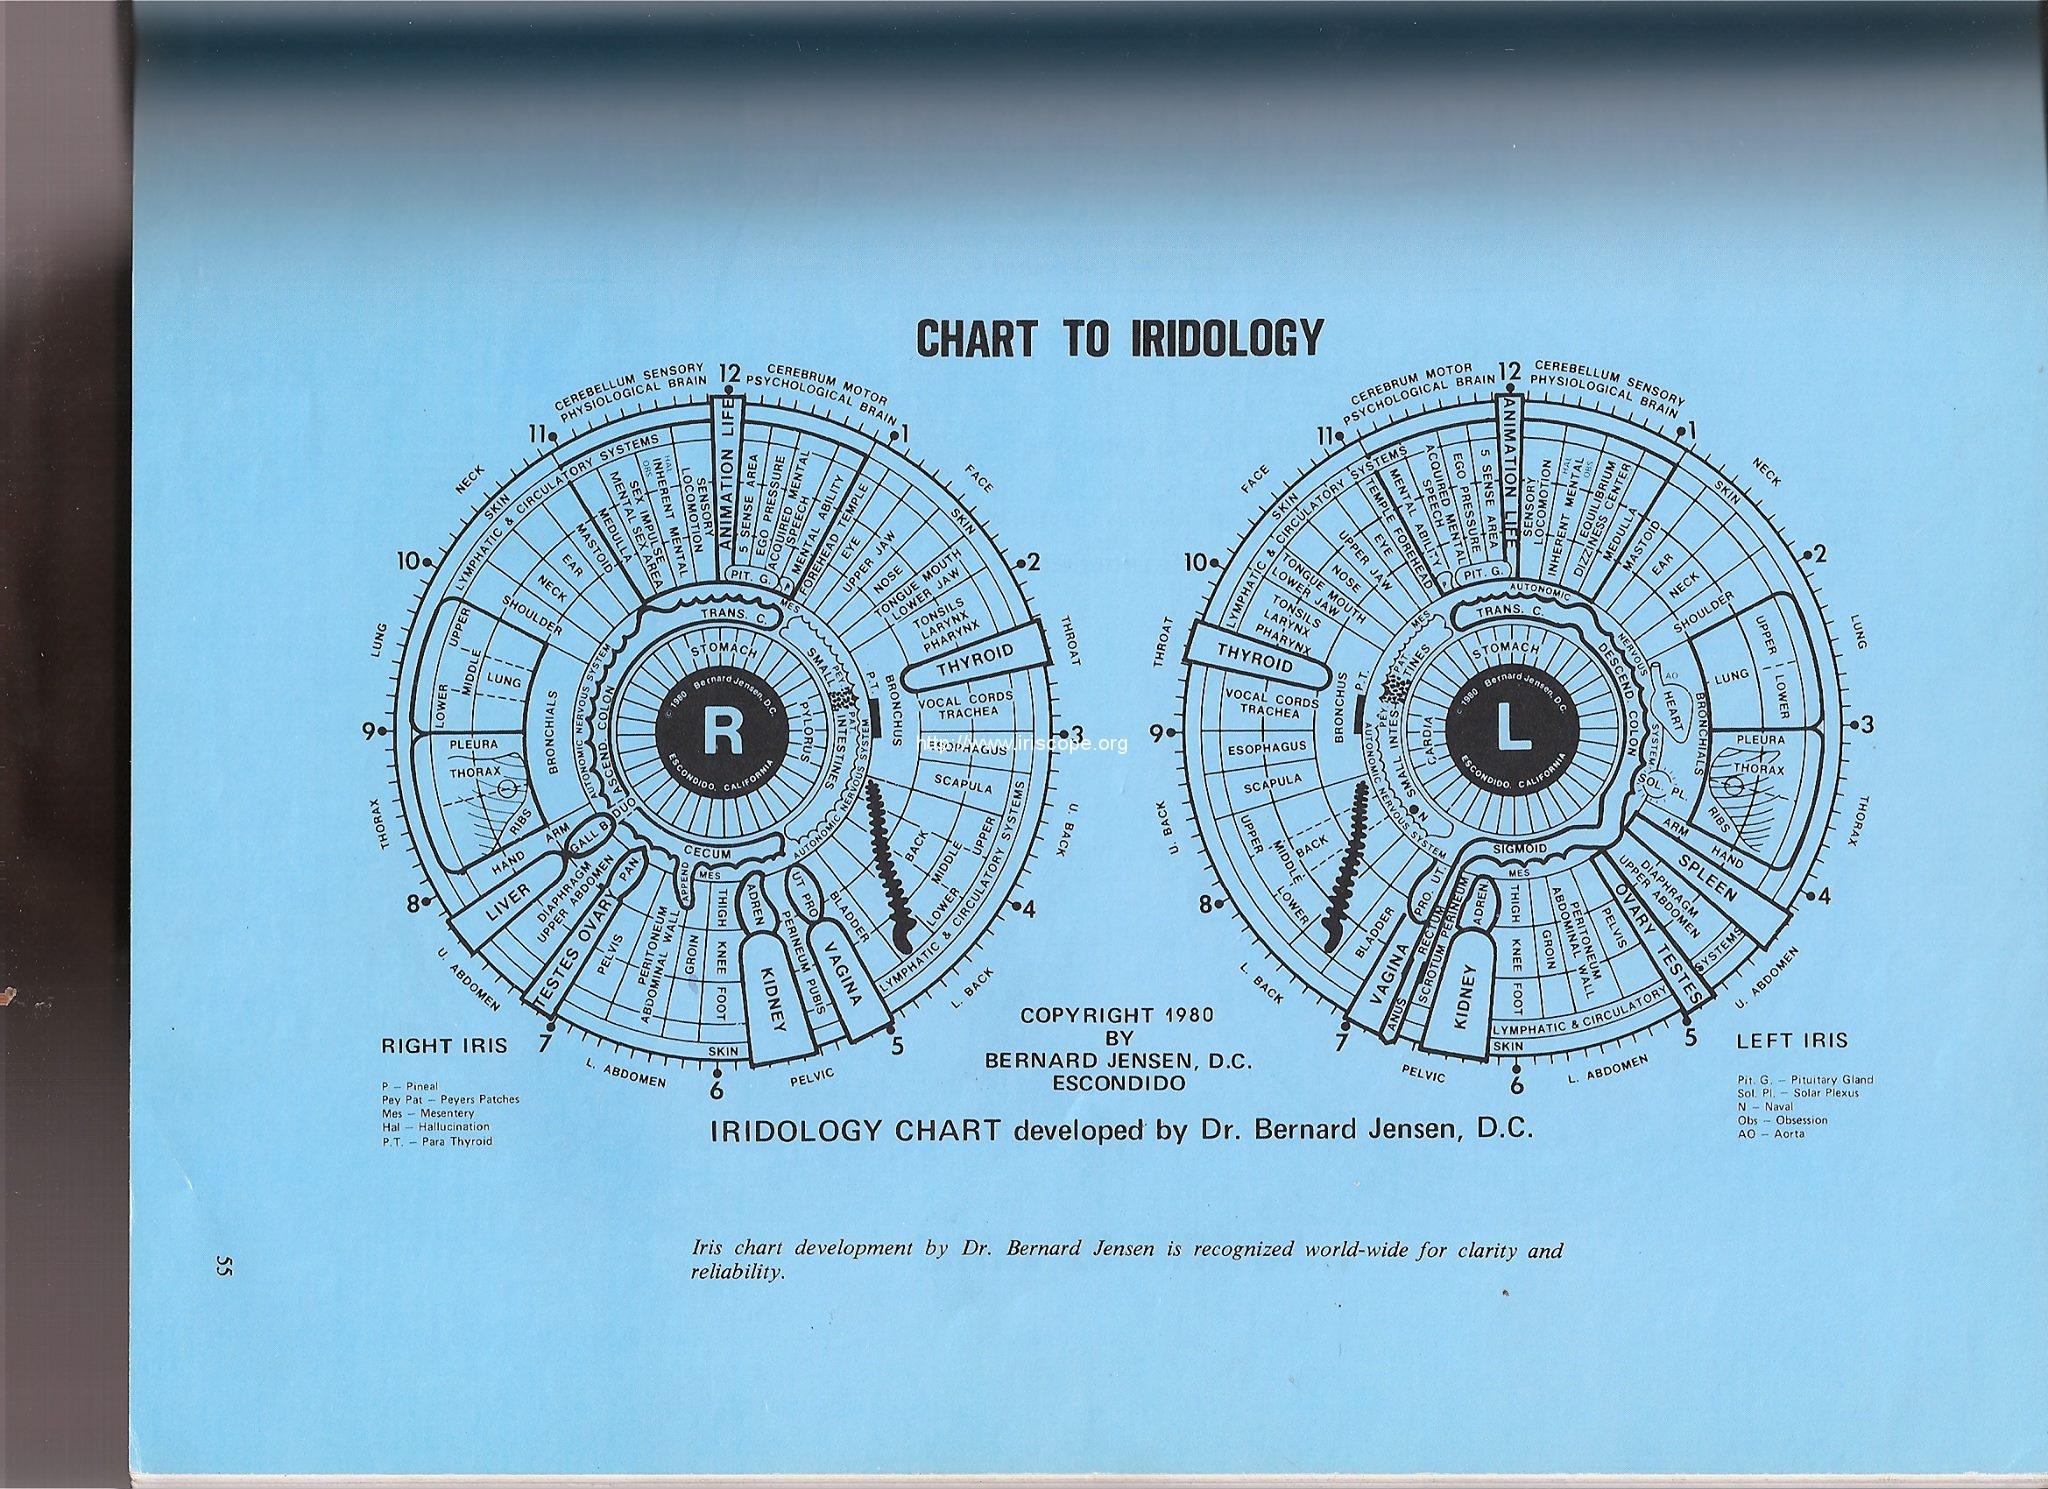 Dr. Jensen's iridology chart